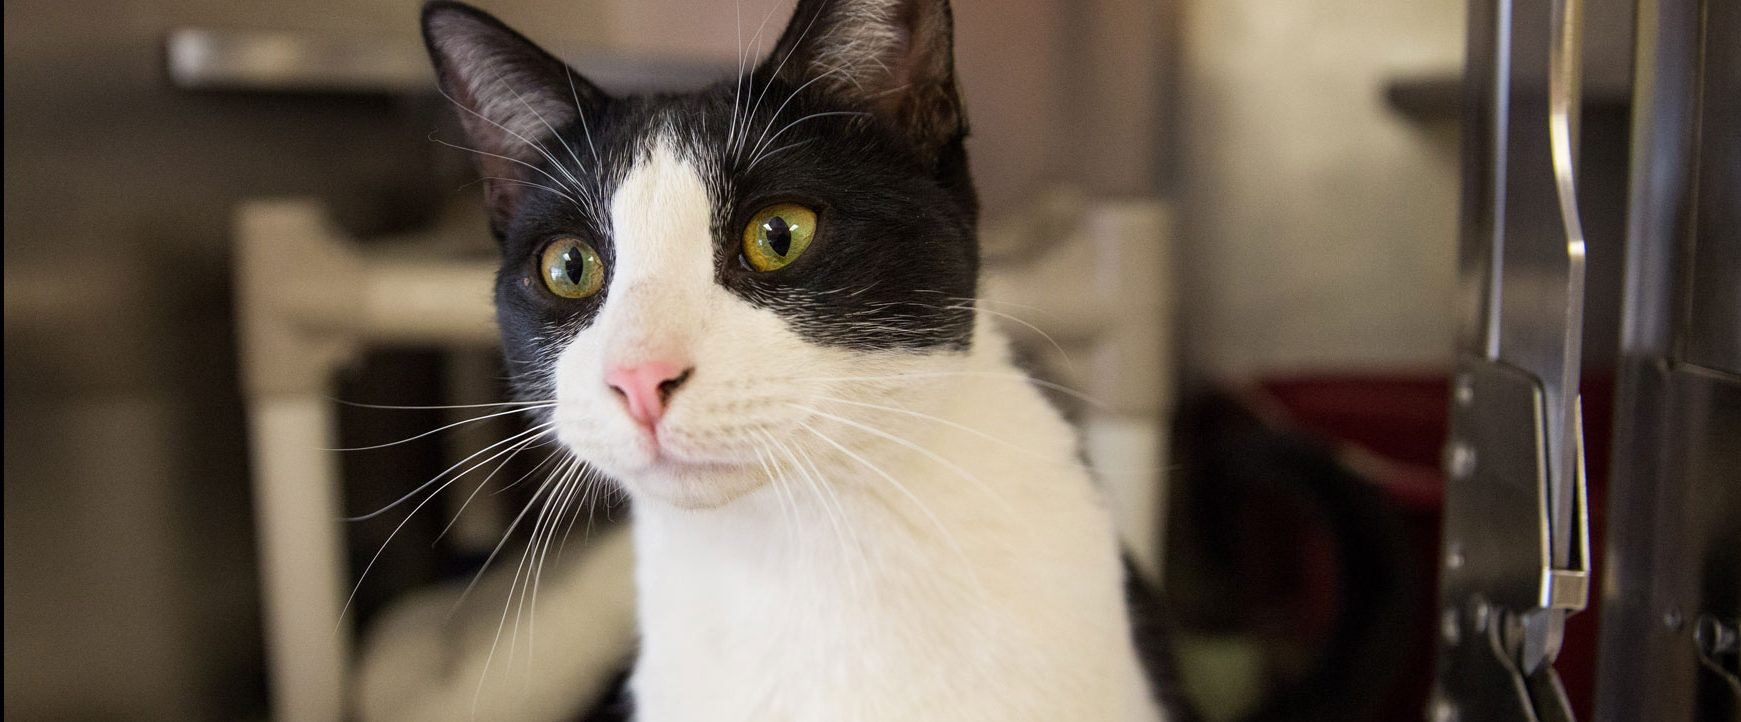 cat looking hopeful